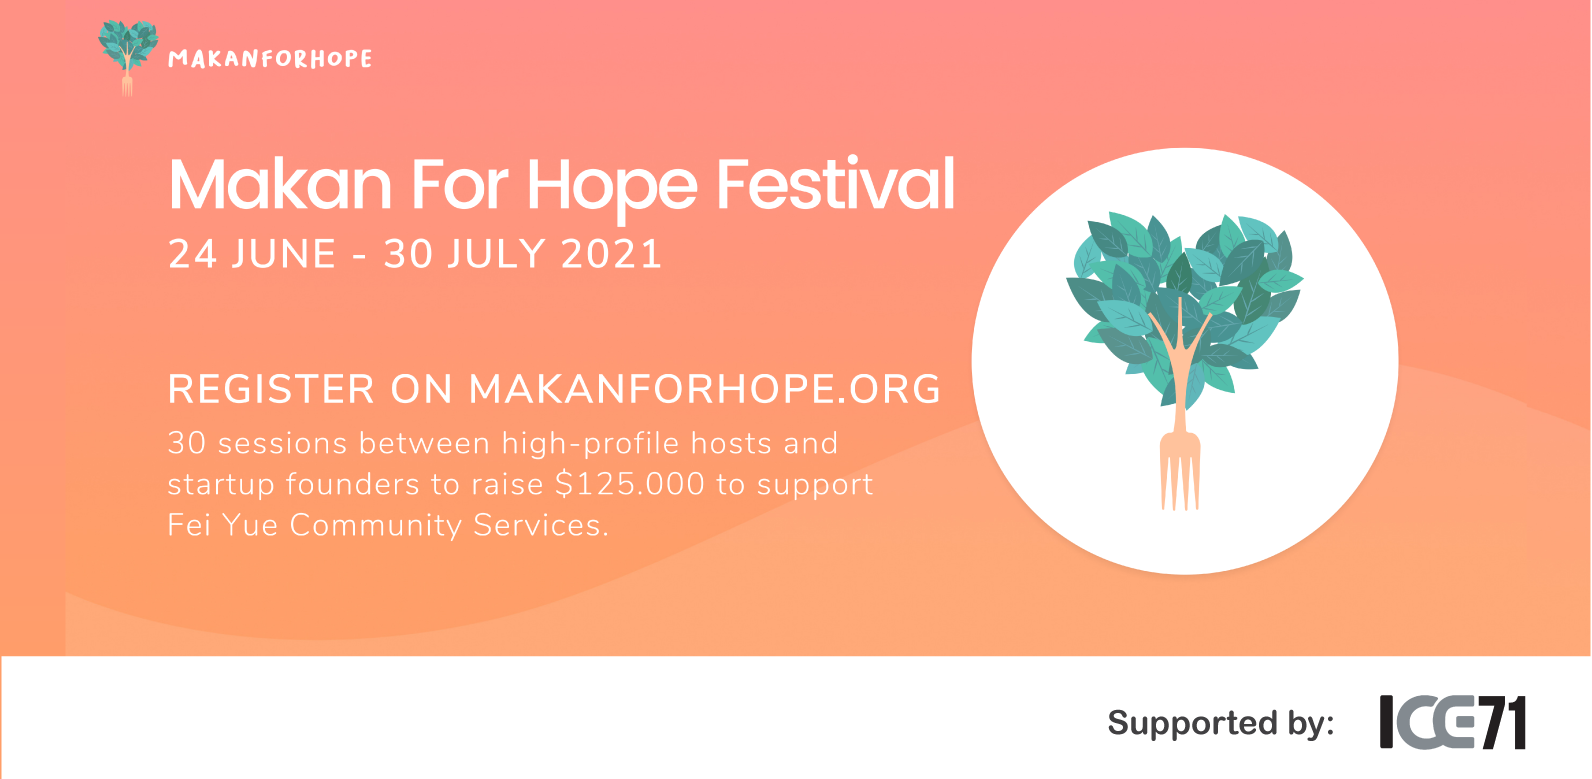 ICE71 at Makanforhope Festival 2021